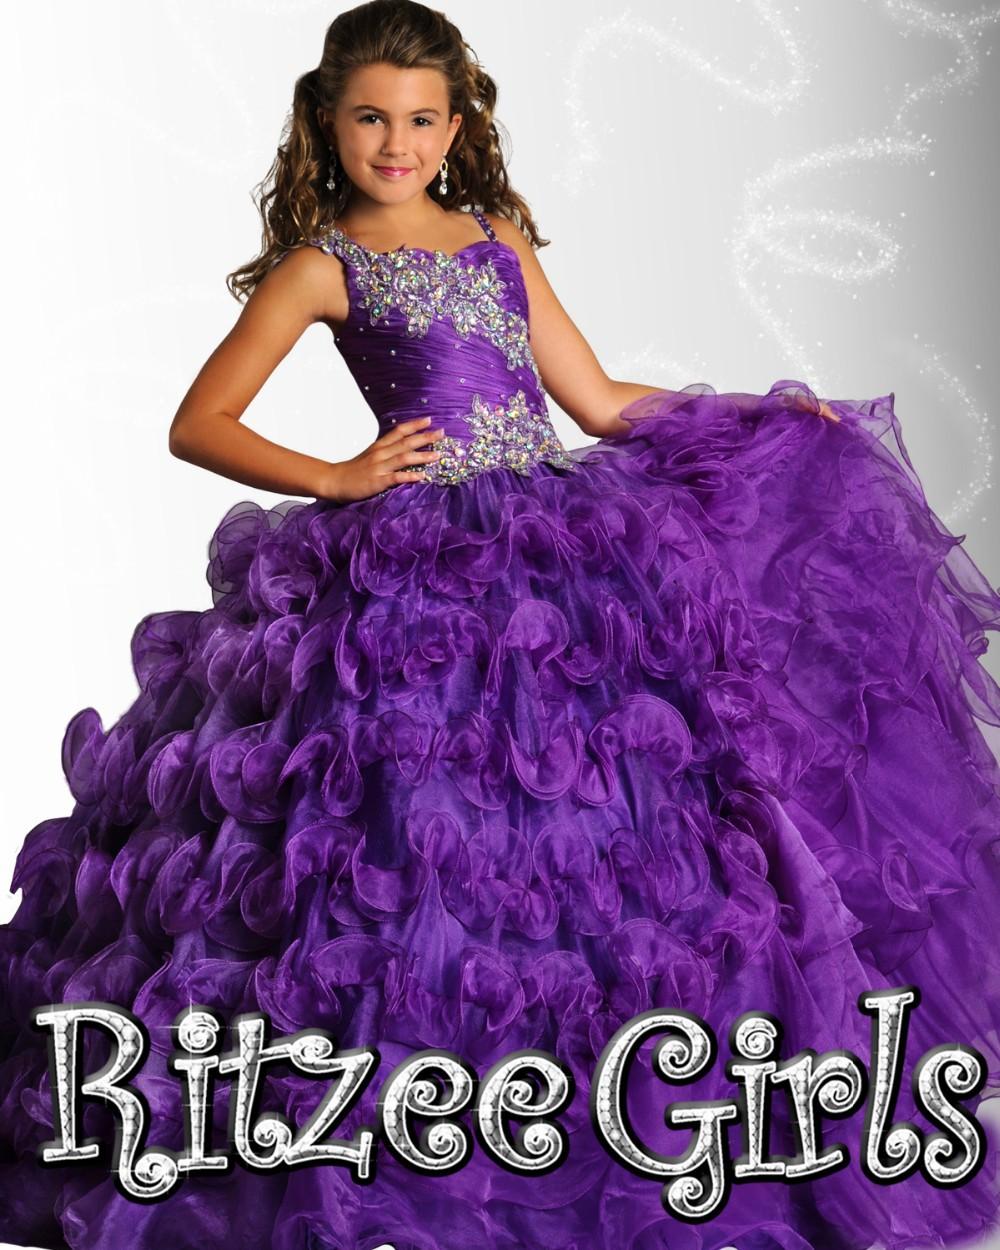 Dresses for girls 10-12 purple 2017